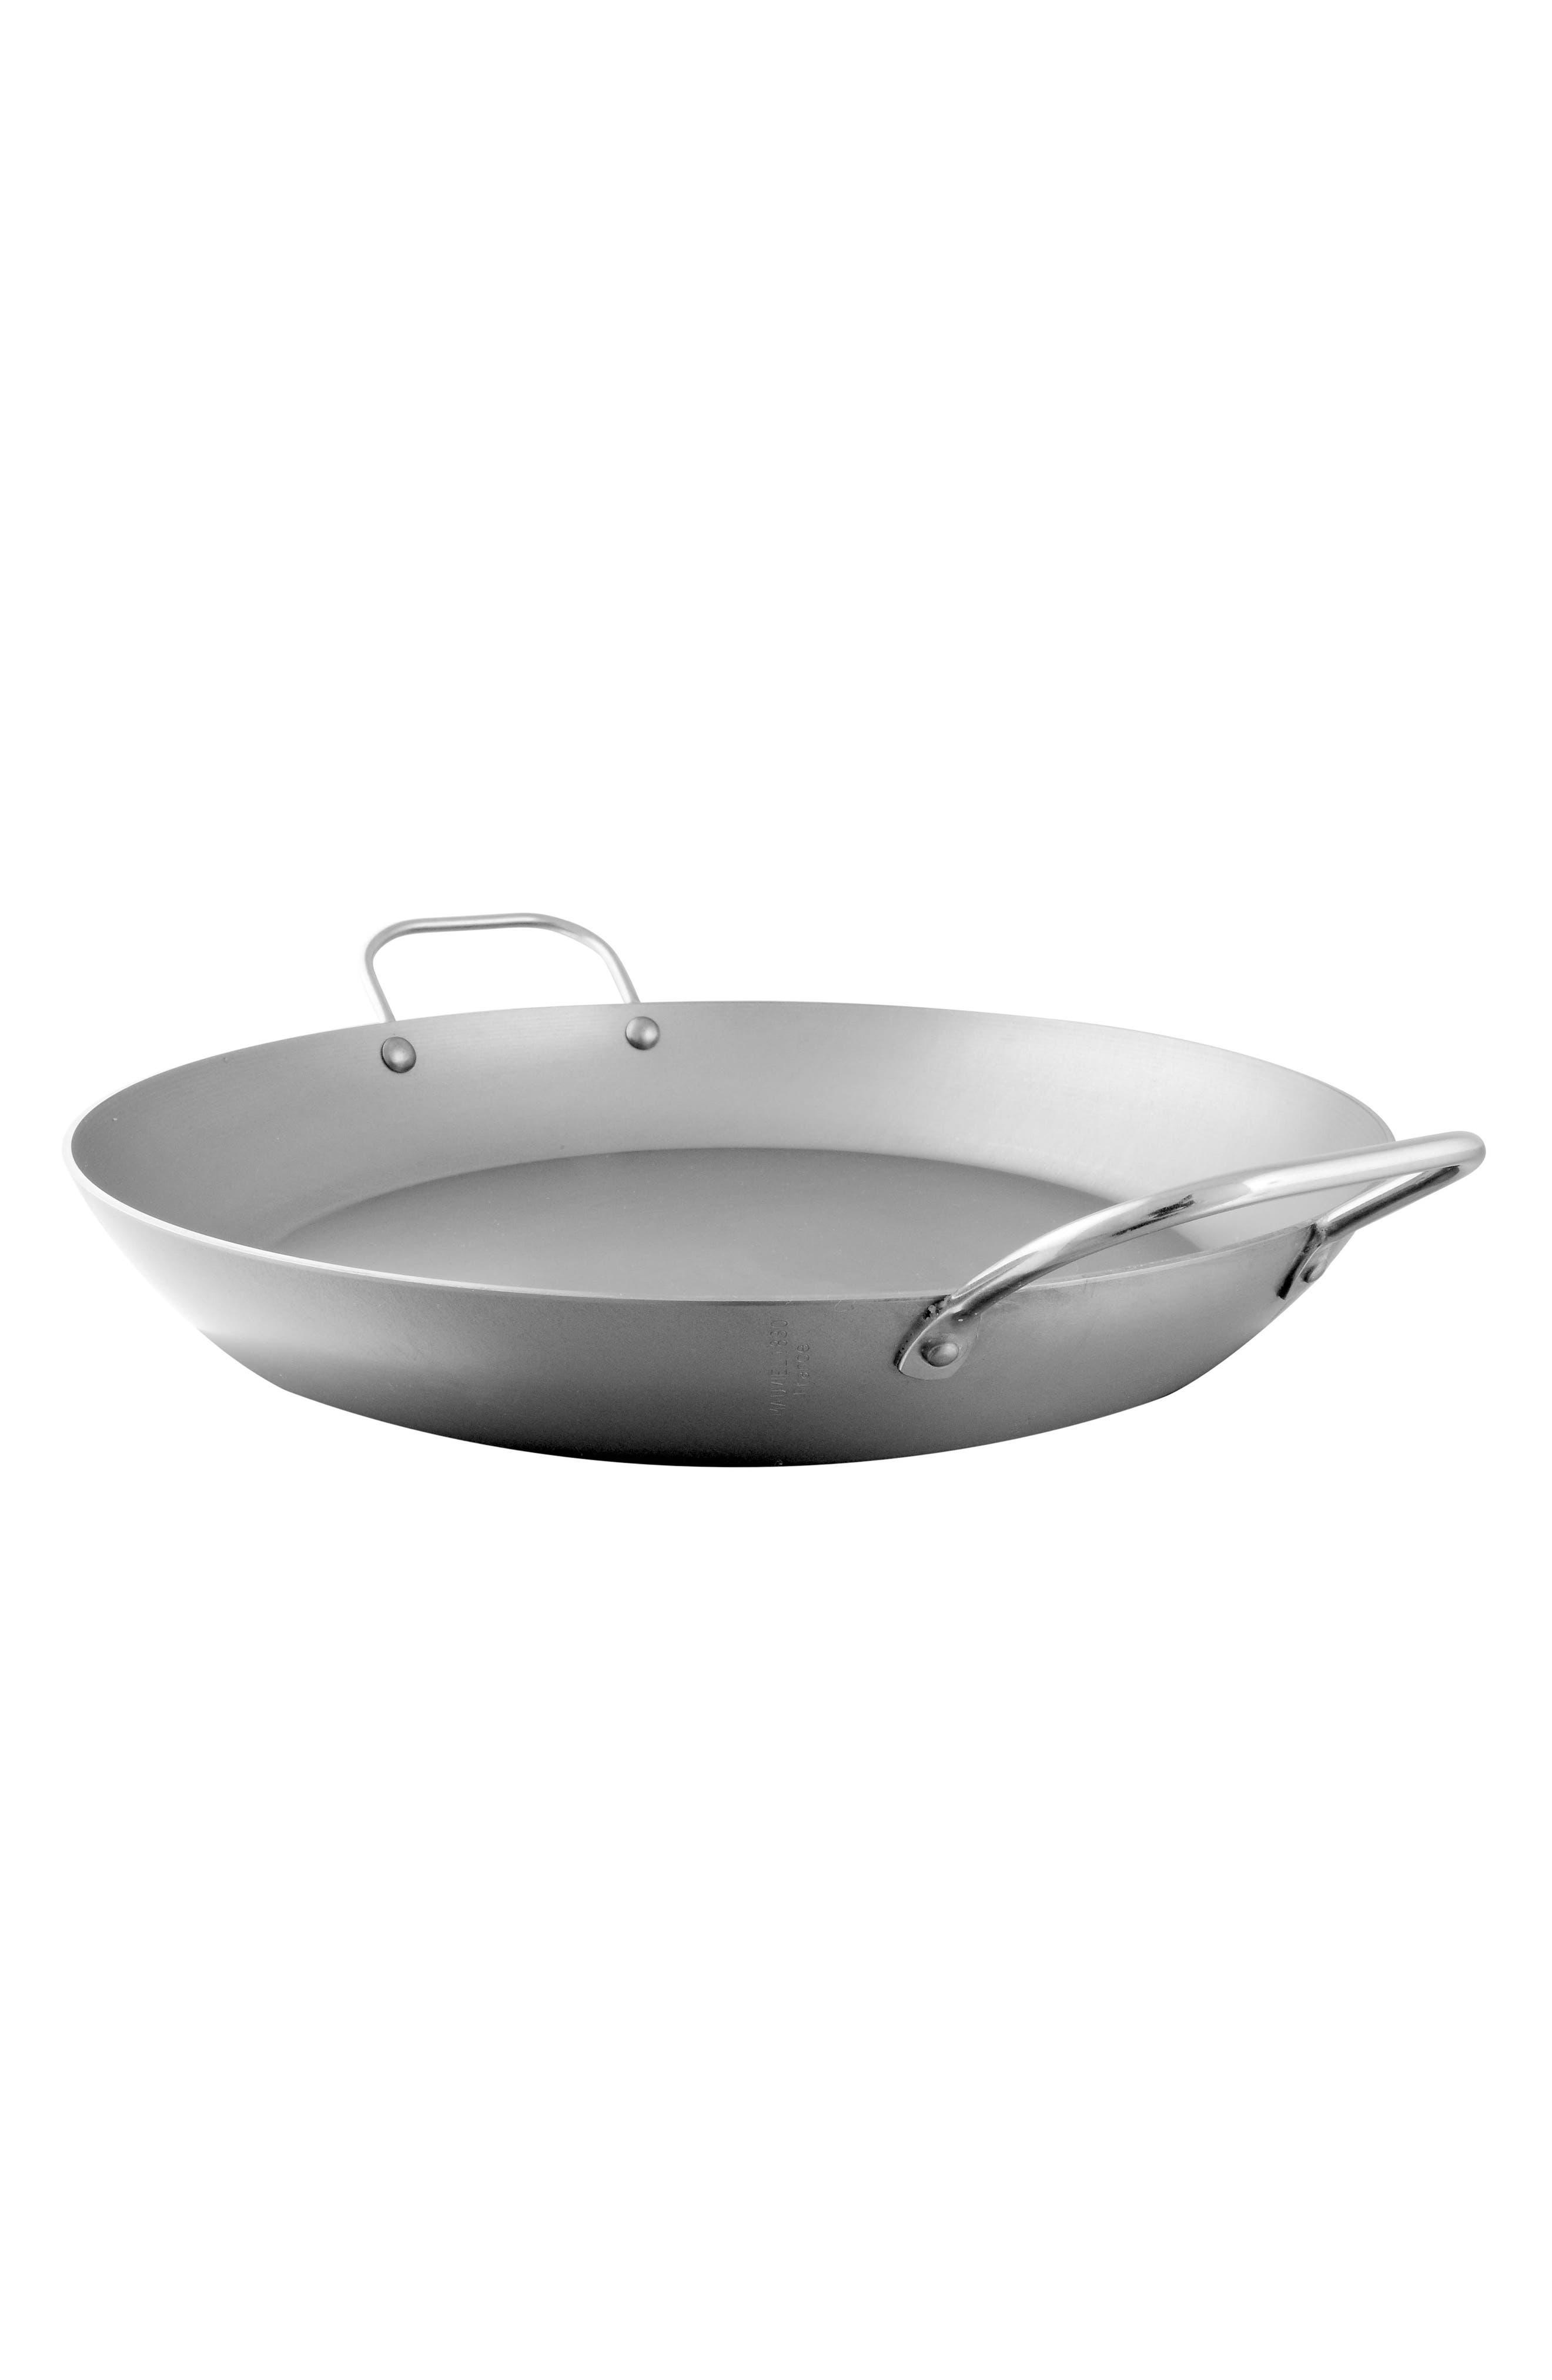 Main Image - Mauviel M'steel Carbon Steel Paella Pan